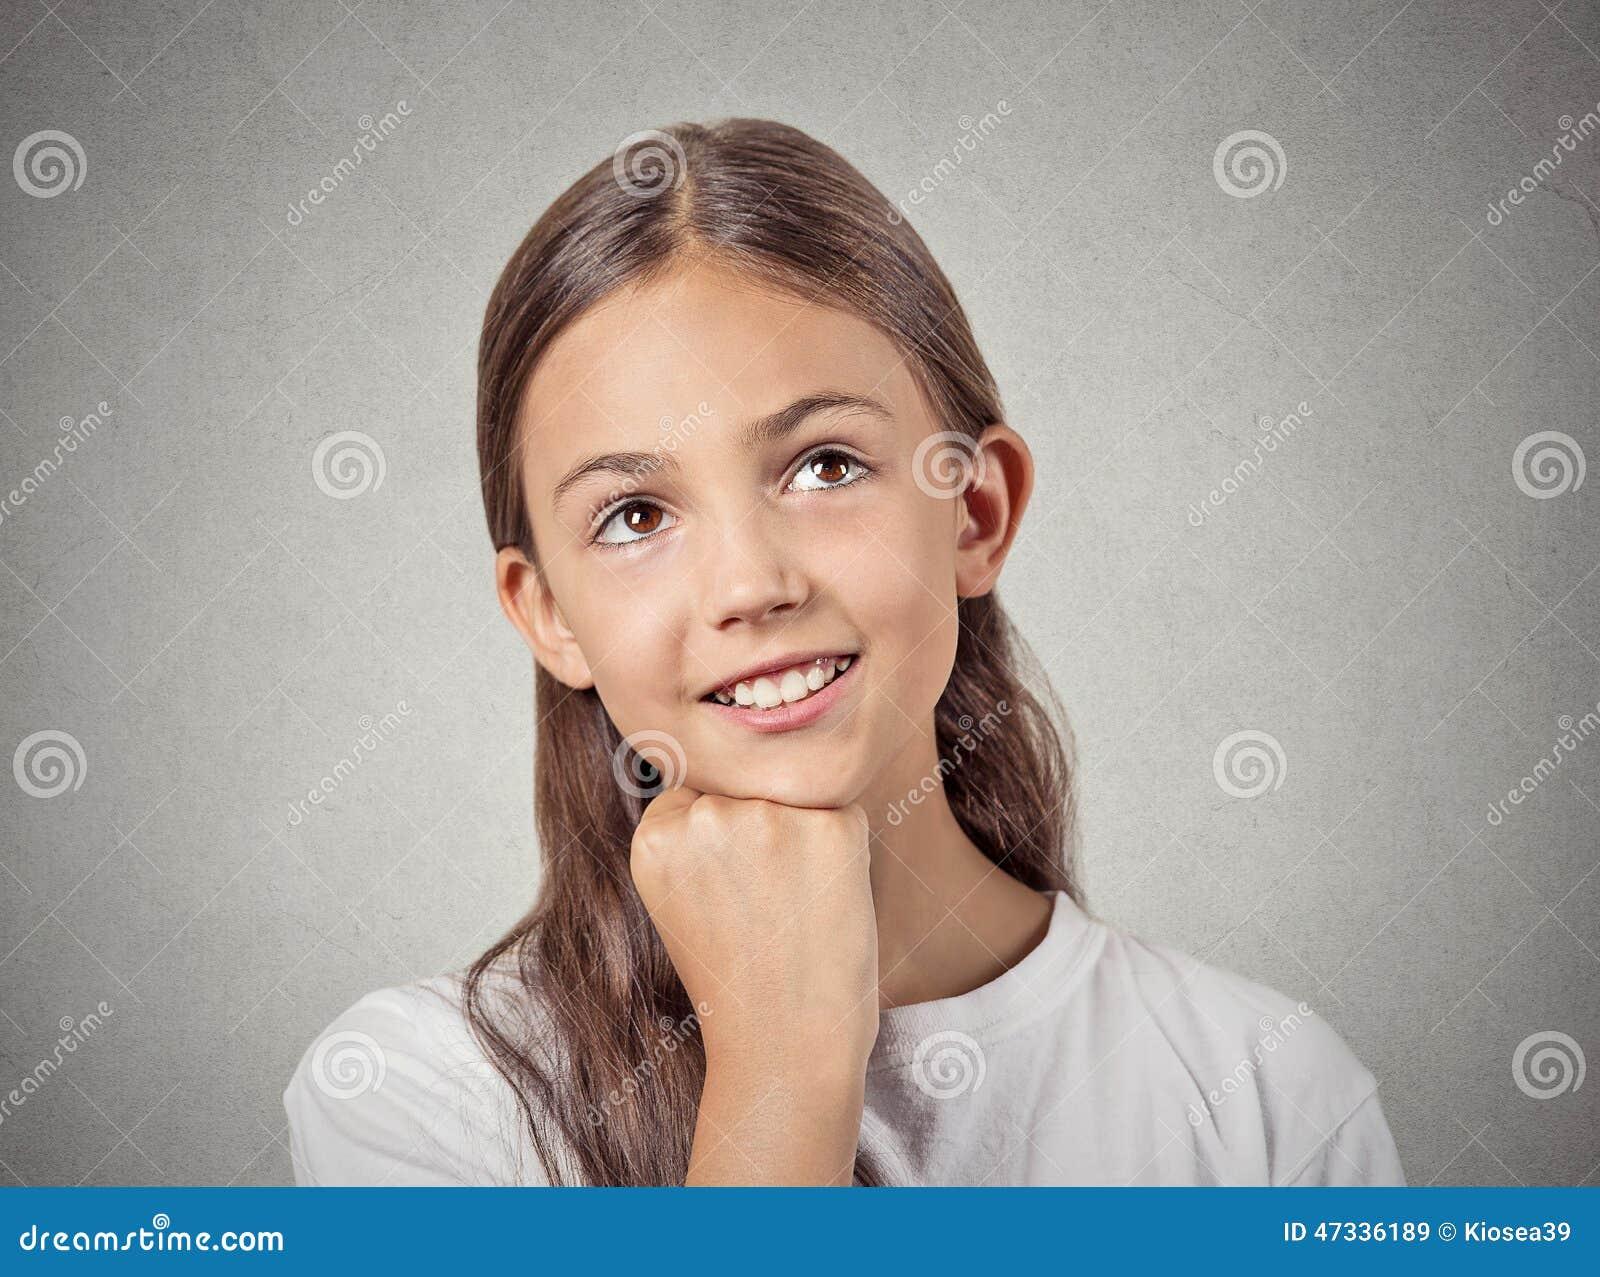 Dagdromenkind glimlachend meisje stock afbeelding afbeelding 47336189 - Tiener meubilair ruimte meisje ...